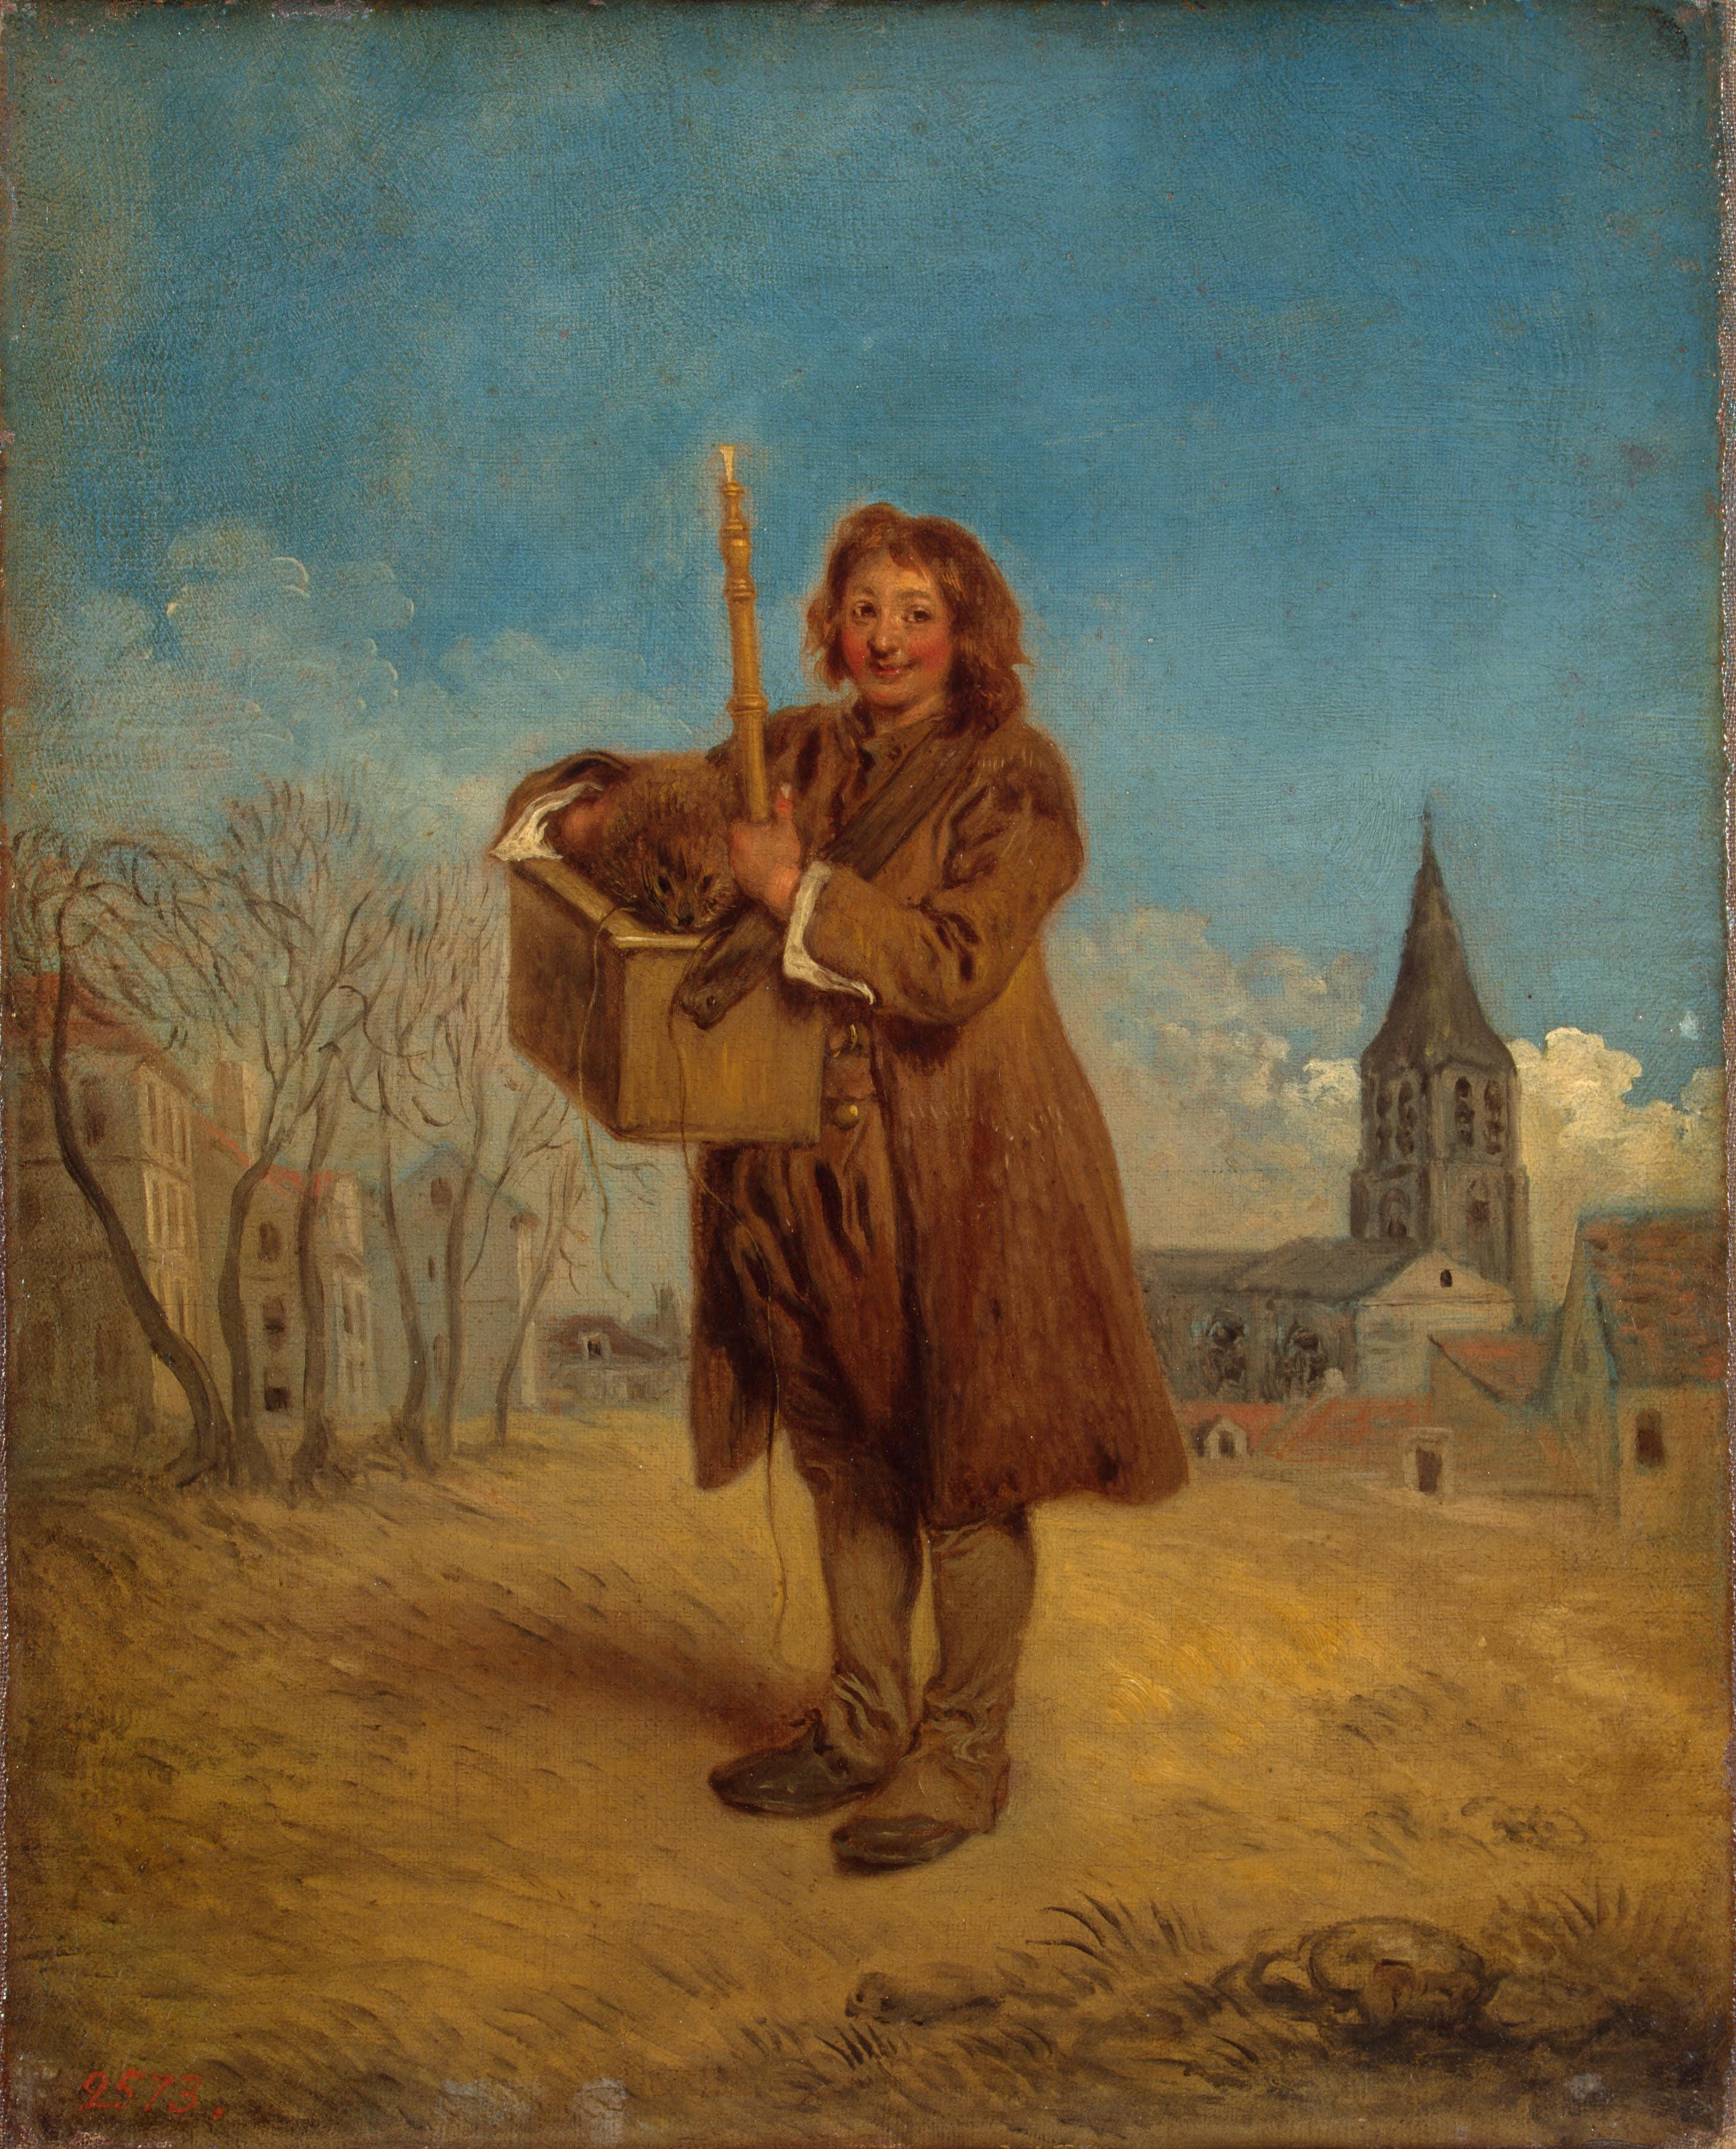 File:Antoine Watteau, Le Savoyard et la marmotte (1716).jpg